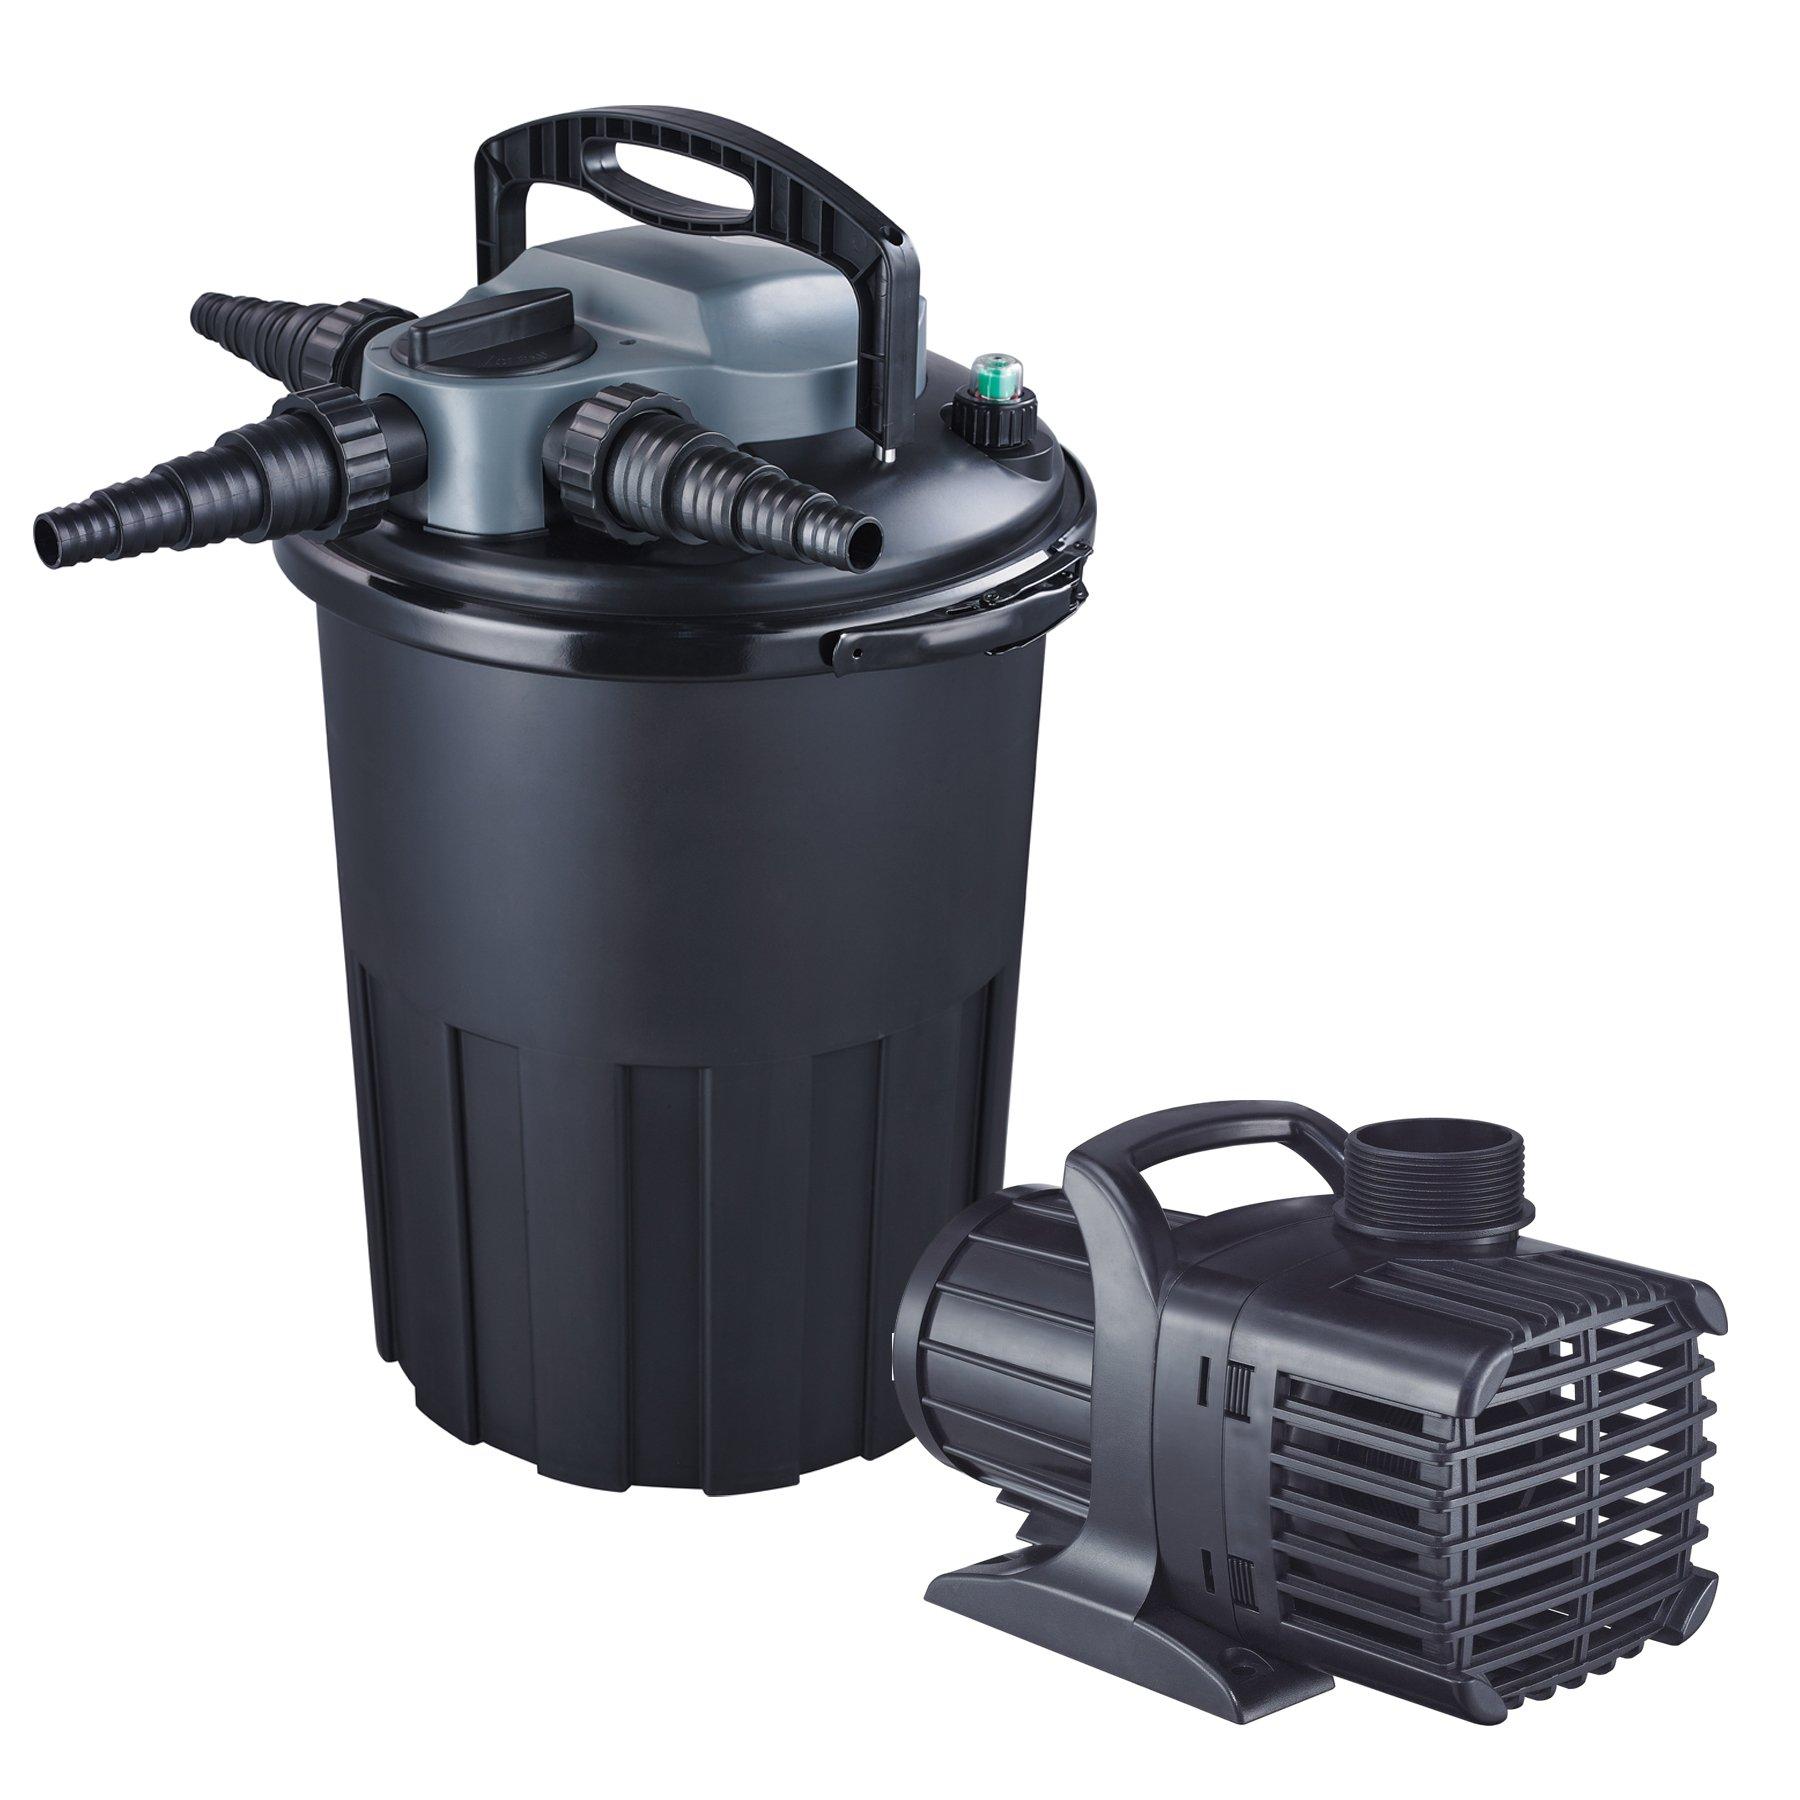 Jebao CBF-15000 36-watt UVC Bio Pressure Pond Filter with 3000GPH Pump, Up to 4000 gallon